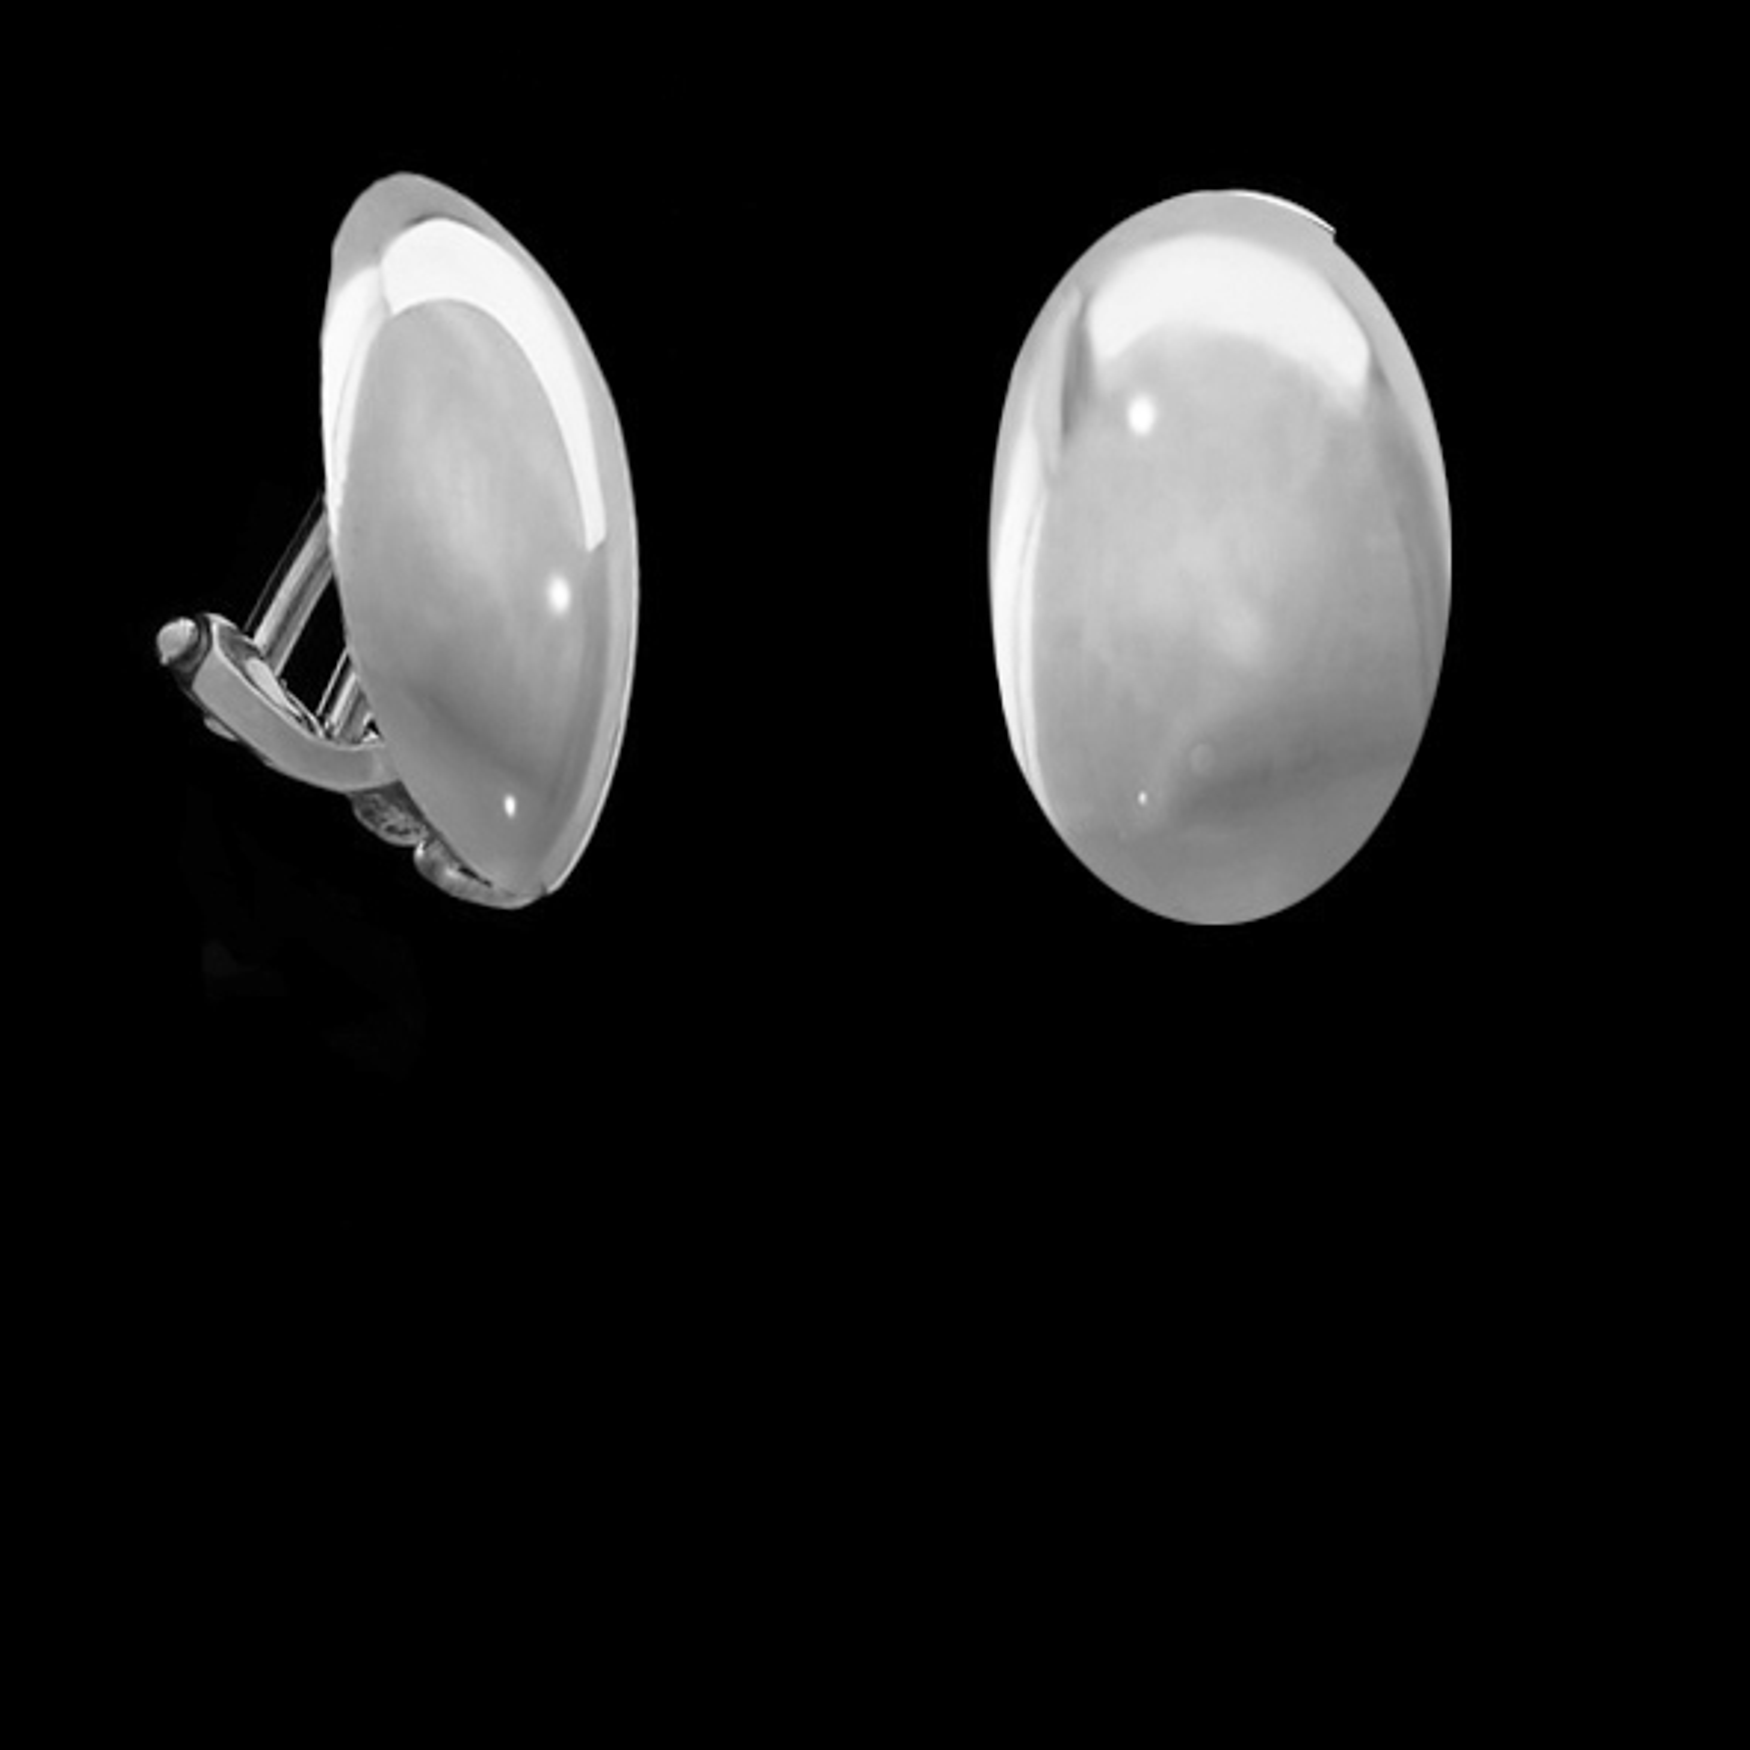 Ohrclip - oval, silber